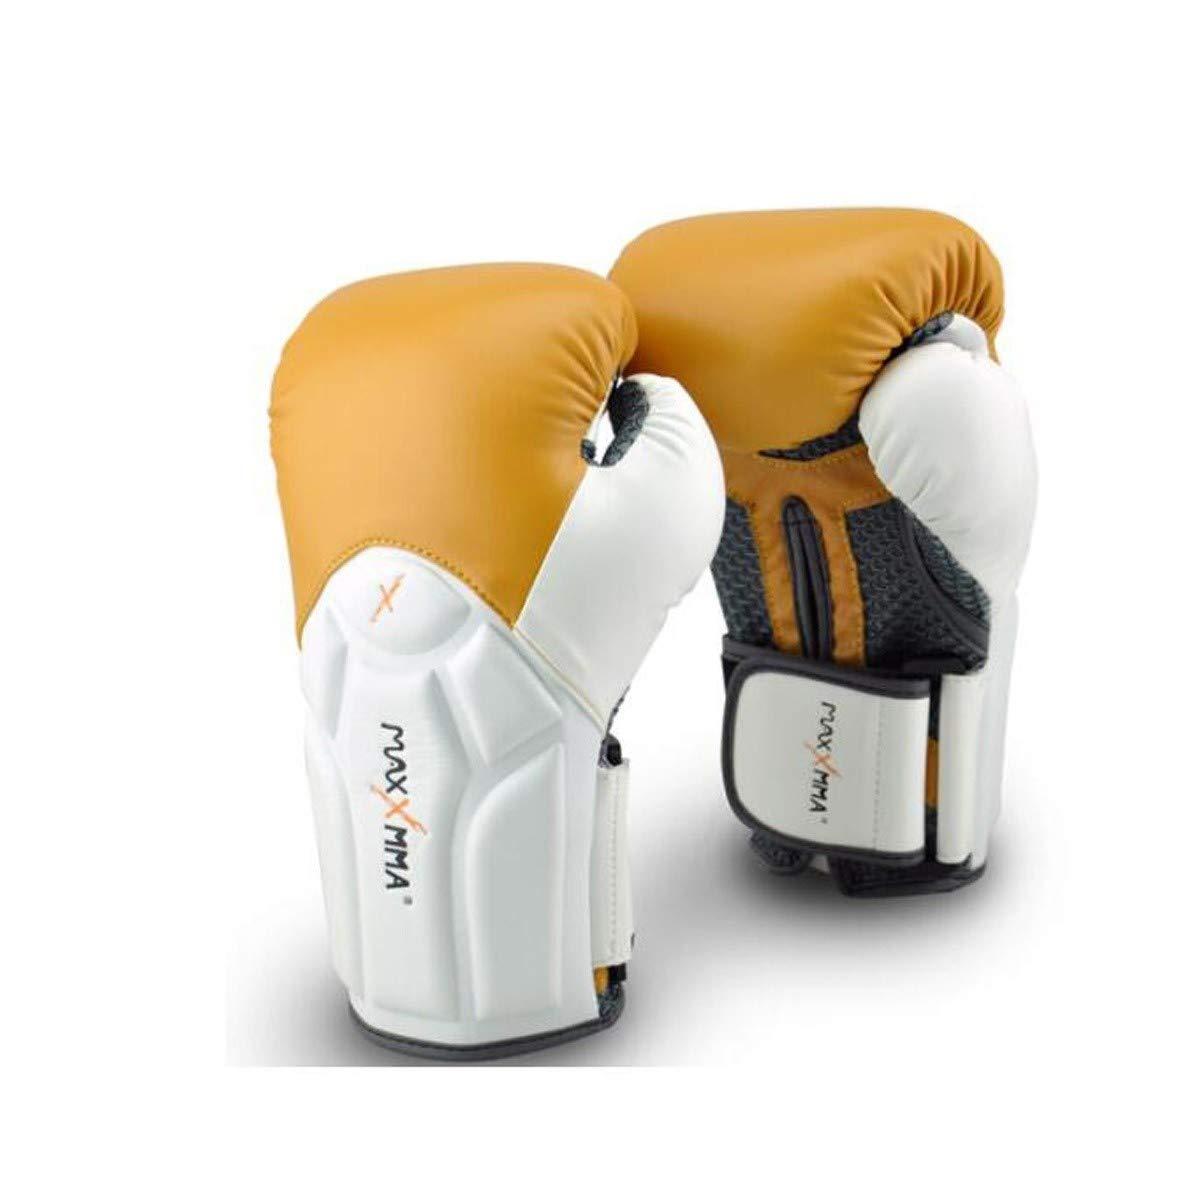 LHSY ボクシング手首の手袋手袋ファッションファイティングフィットネストレーニングムエタイ三田市武道 (Color : Camel color, Size : 14oz) Camel color 14oz